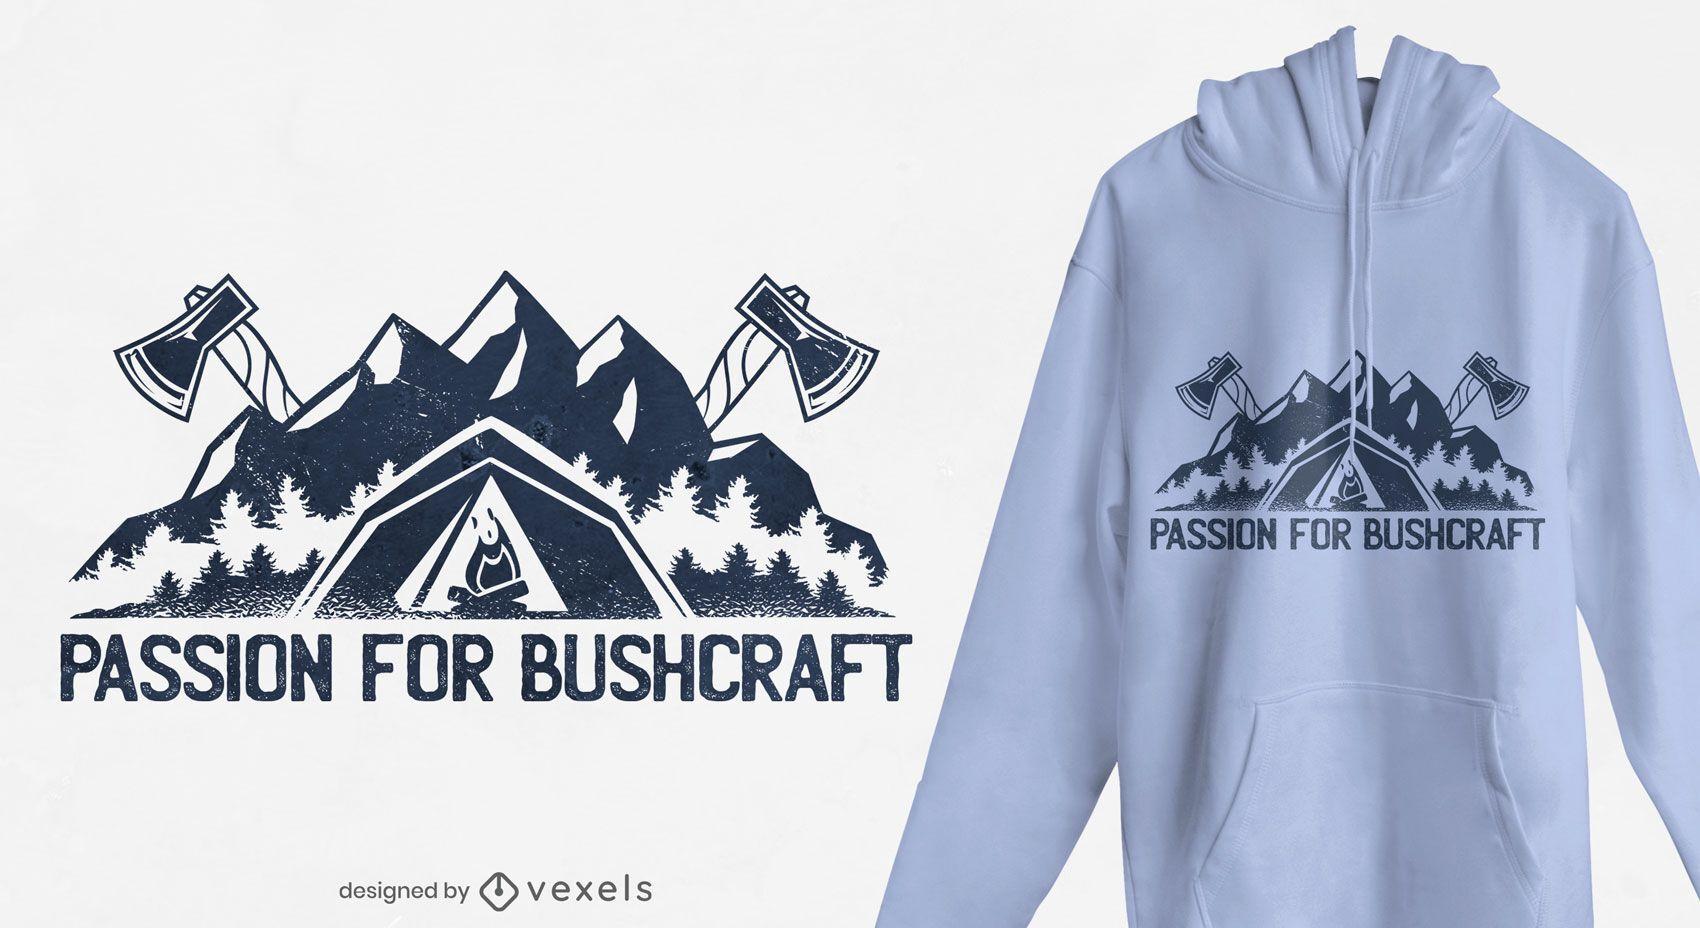 Dise?o de camiseta Bushcraft passion